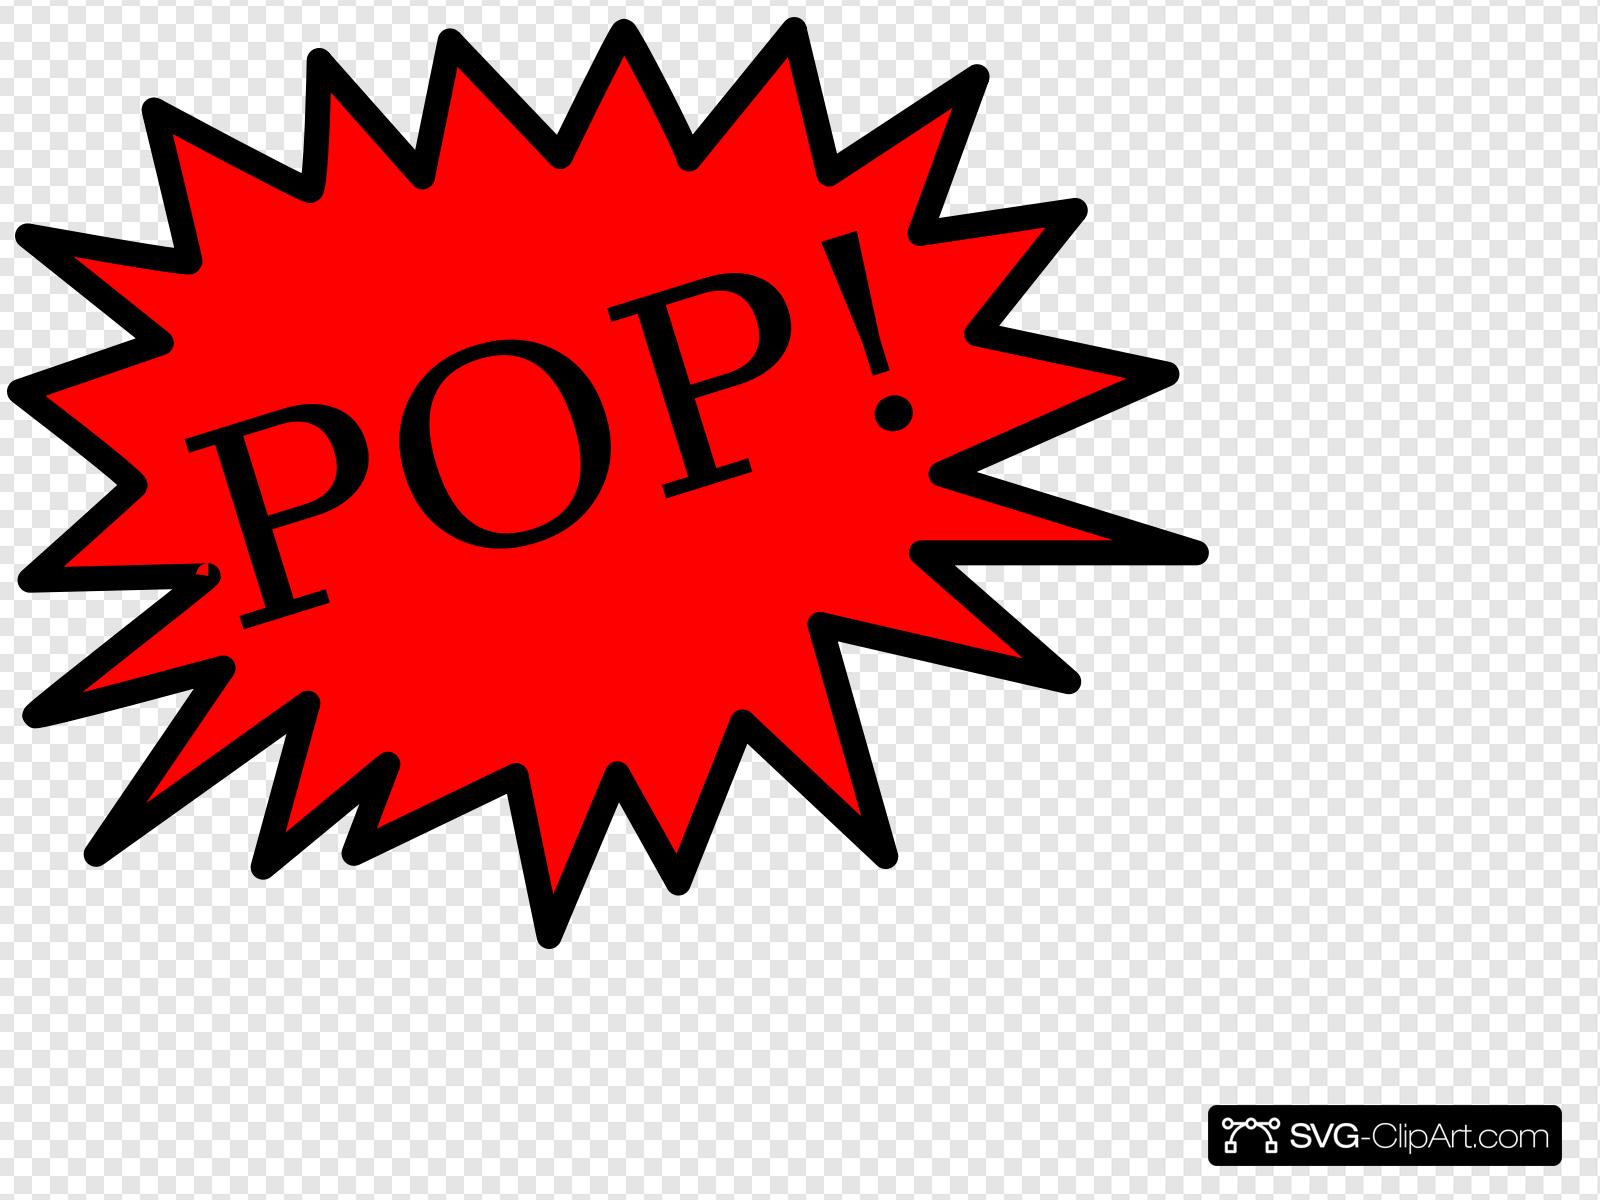 Balloon Pop Clip art, Icon and SVG.